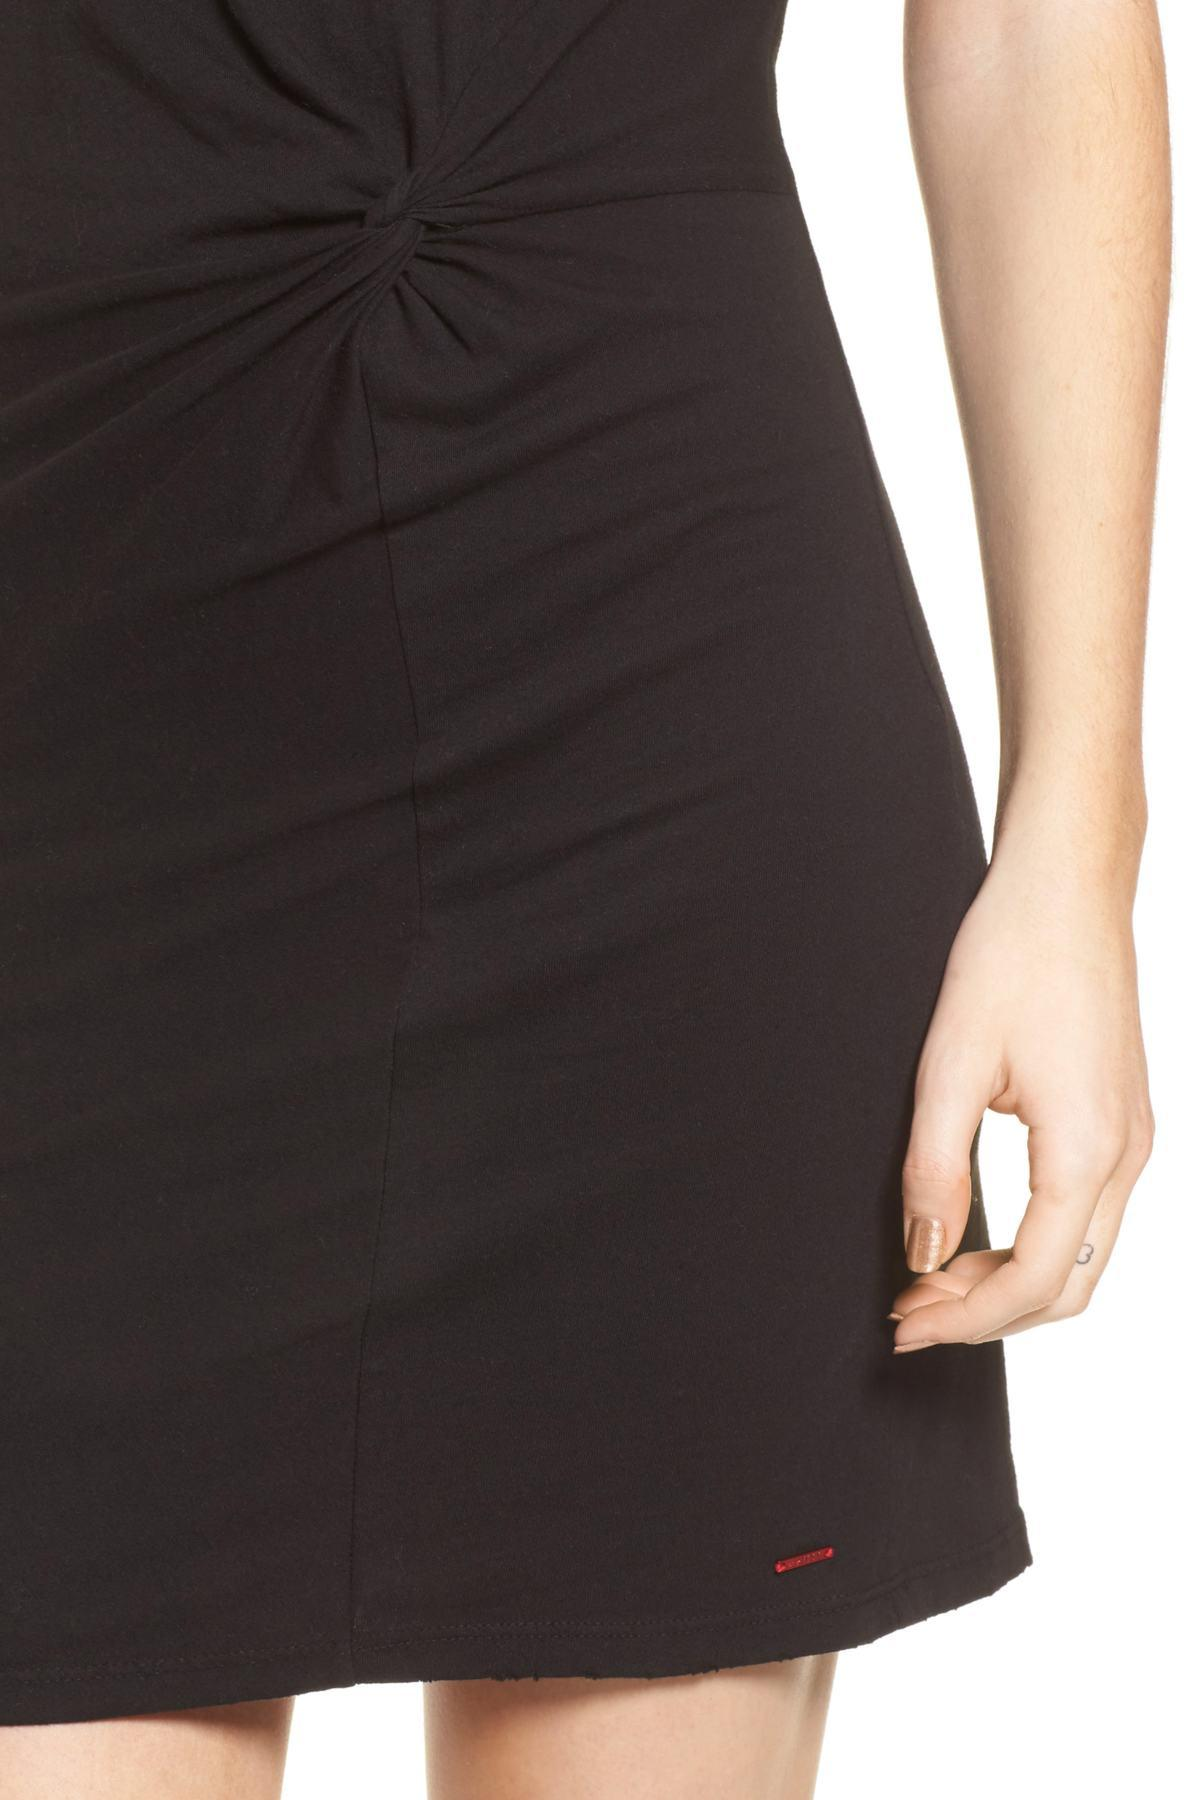 d1389870736 n PHILANTHROPY - Black Jazz Knotted T-shirt Dress - Lyst. View fullscreen